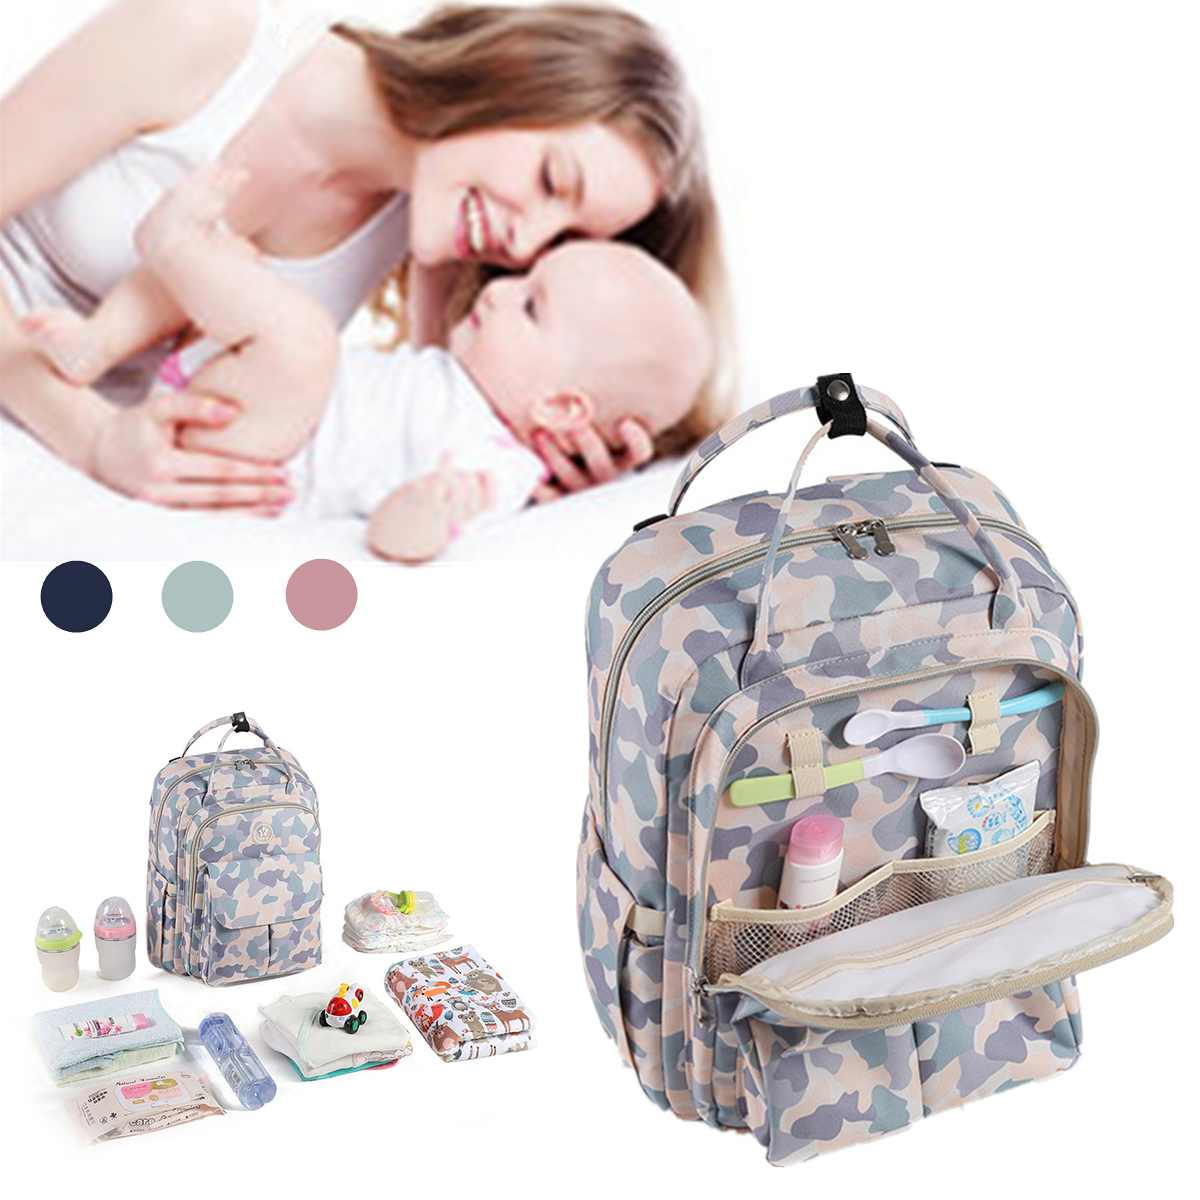 Diaper Bag Maternity Bag For Baby Nursing Large Capacity Waterproof Backpack For Mom Mummy Baby Bag Stroller Organizer Nappy BagDiaper Bag Maternity Bag For Baby Nursing Large Capacity Waterproof Backpack For Mom Mummy Baby Bag Stroller Organizer Nappy Bag